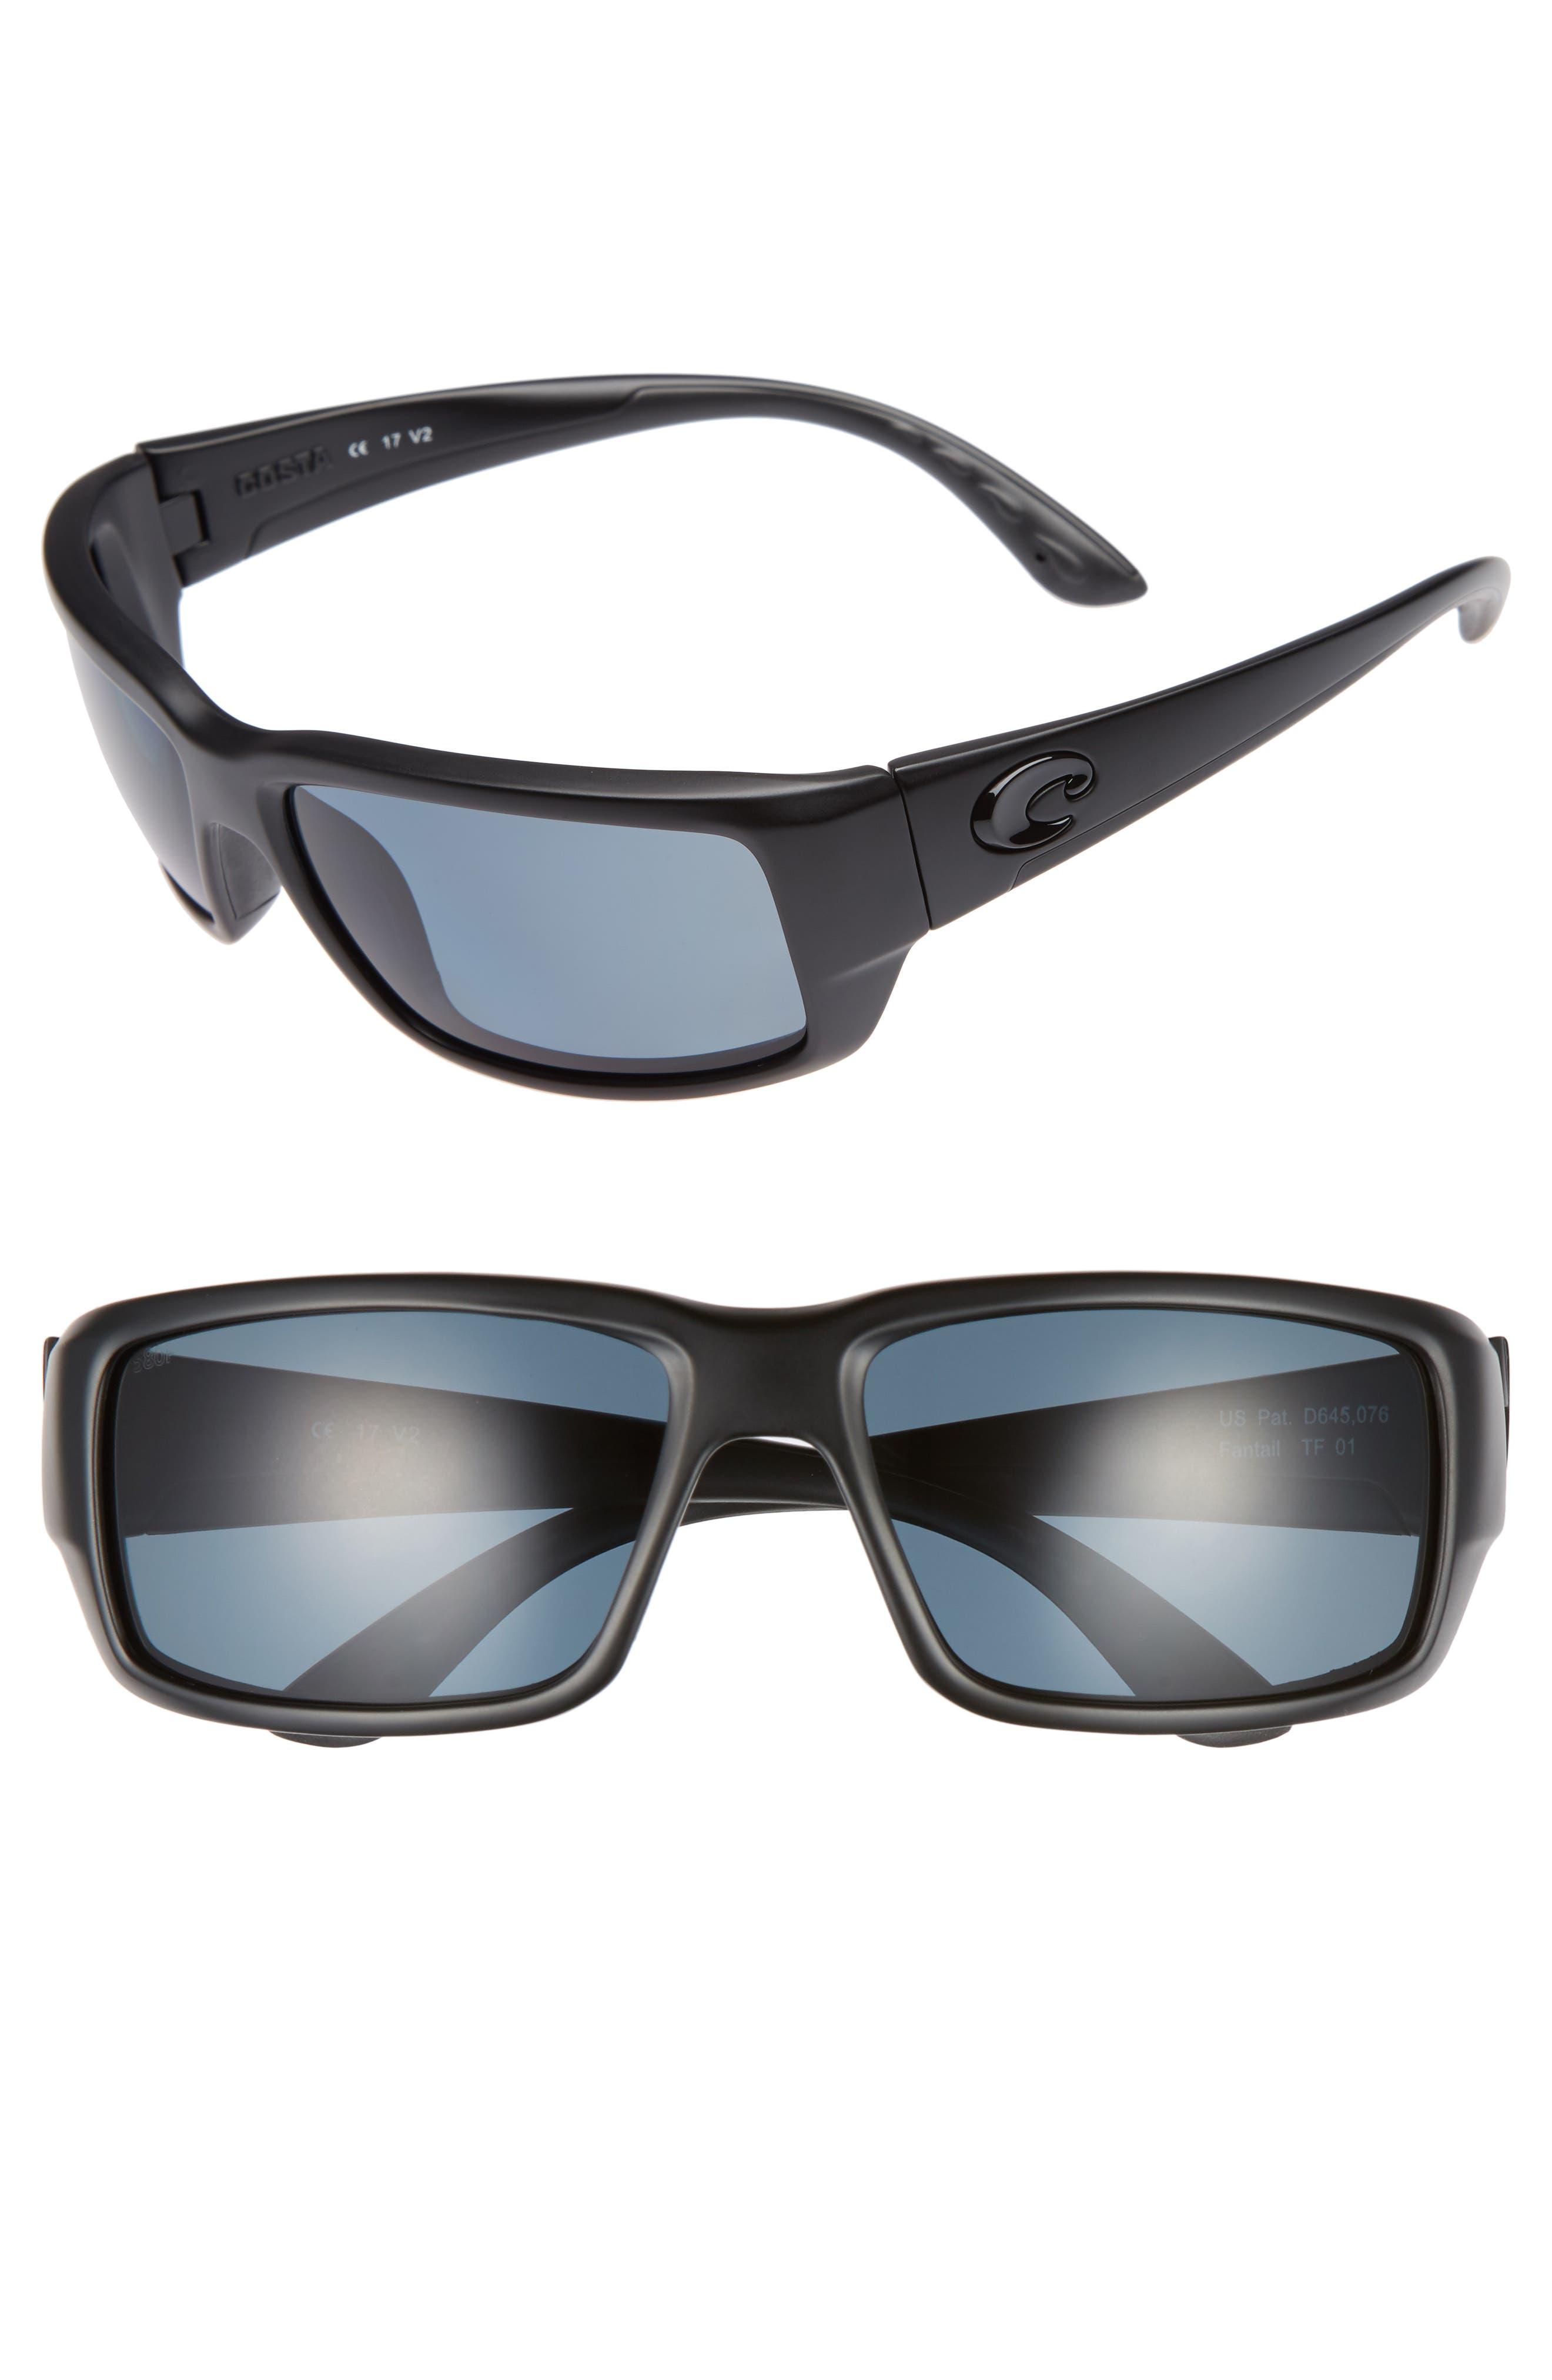 Fantail 60mm Polarized Sunglasses,                             Main thumbnail 1, color,                             001